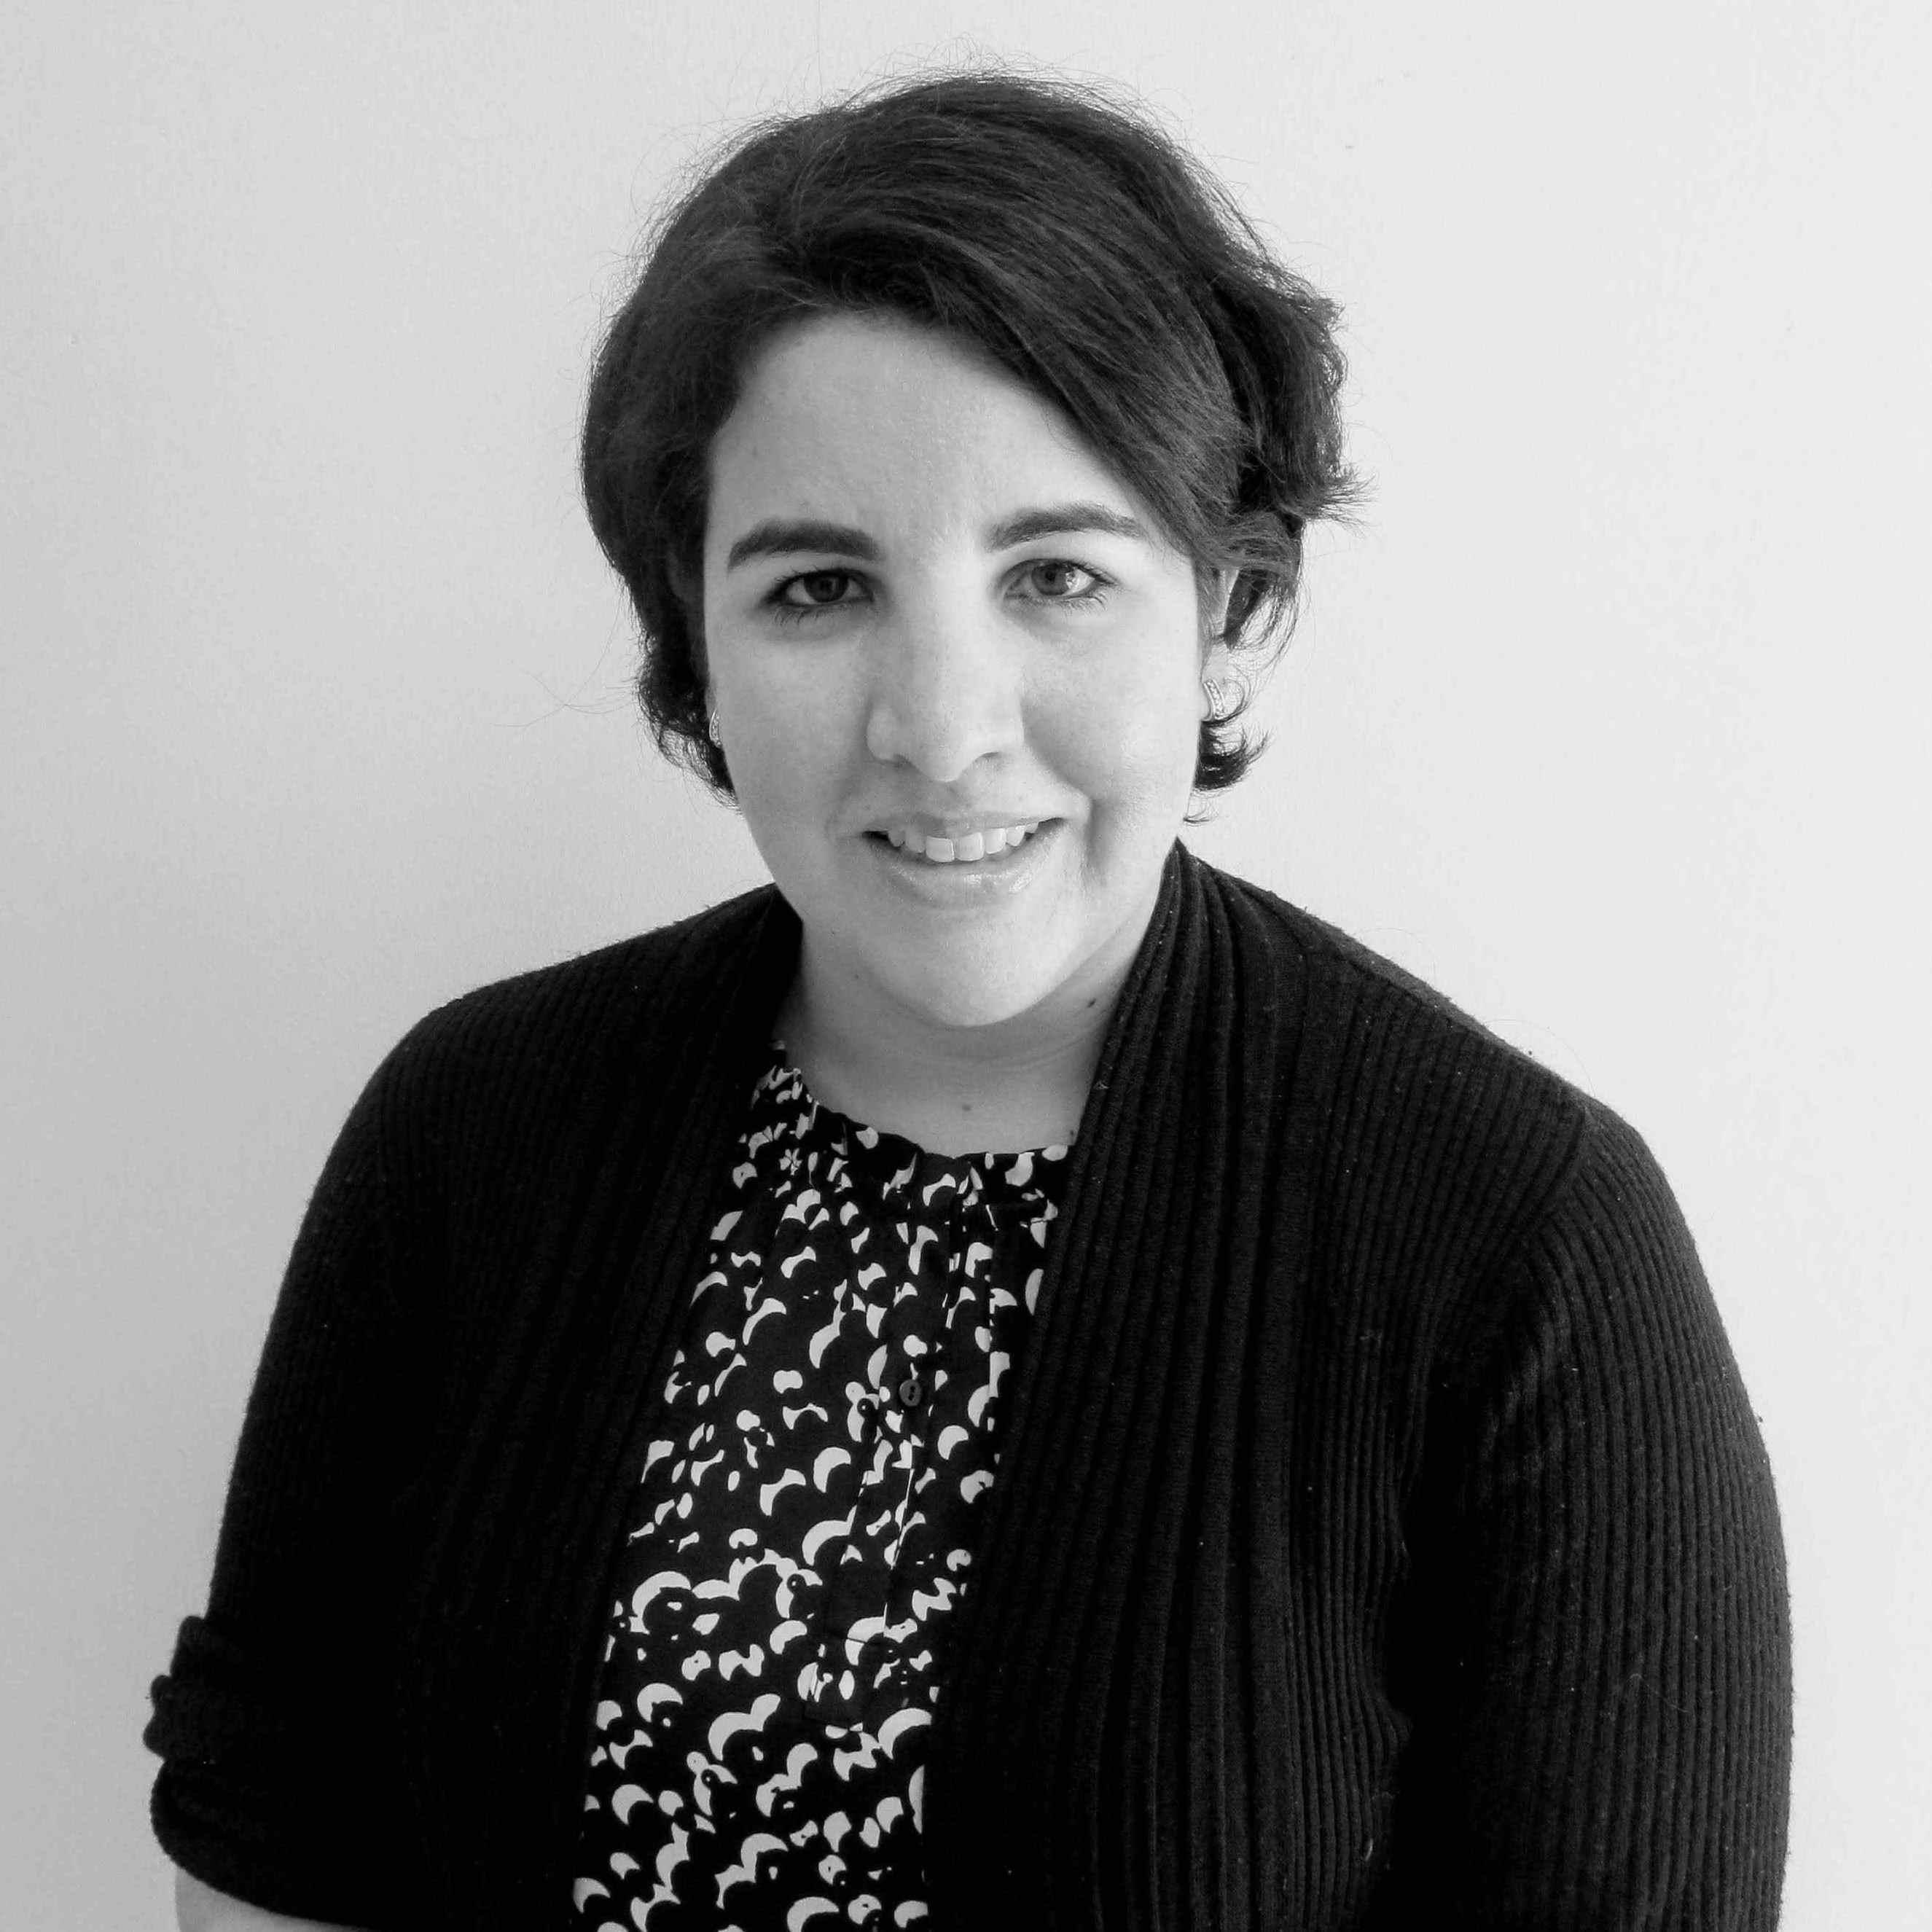 iEARN-USA Change Maker: Katherine Korte GEA Bio